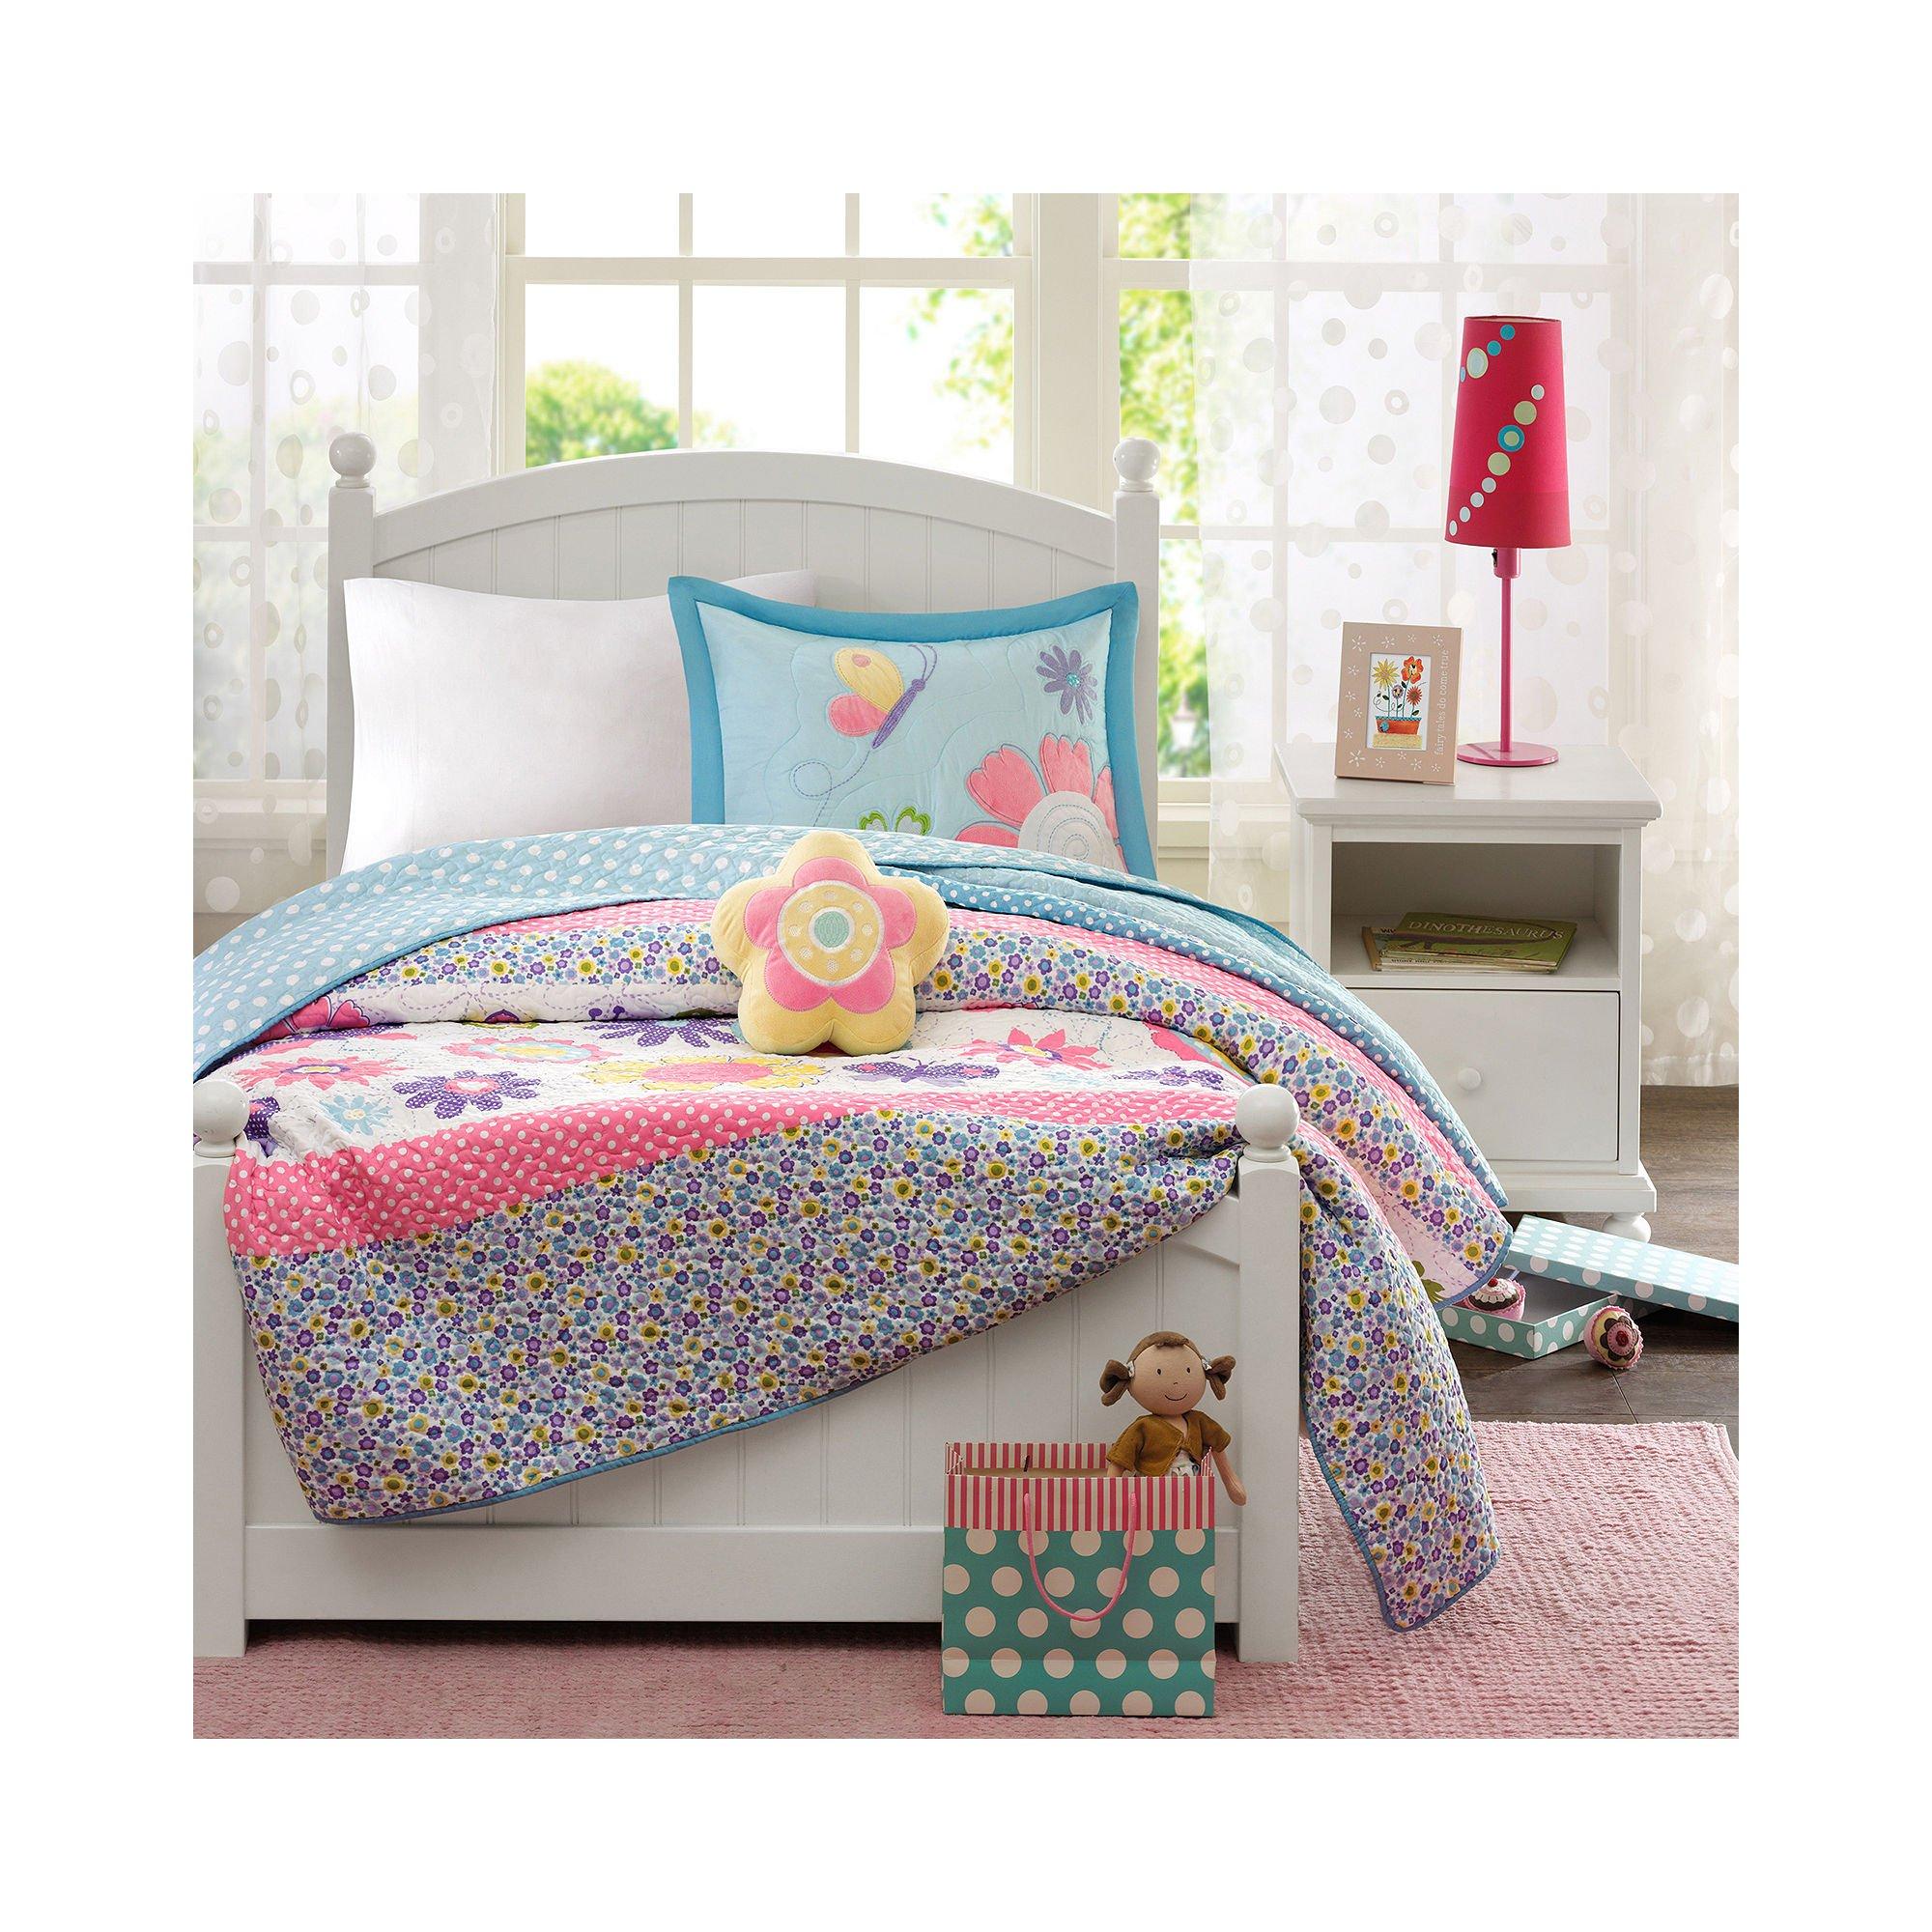 Mi-Zone Kids Crazy Daisy Full/Queen Bedding for Girls Quilt Set - Sky Blue, Pink, Flowers, Butterfly – 4 Piece Kids Girls Quilts – Ultra Soft Microfiber Quilt Sets Coverlet